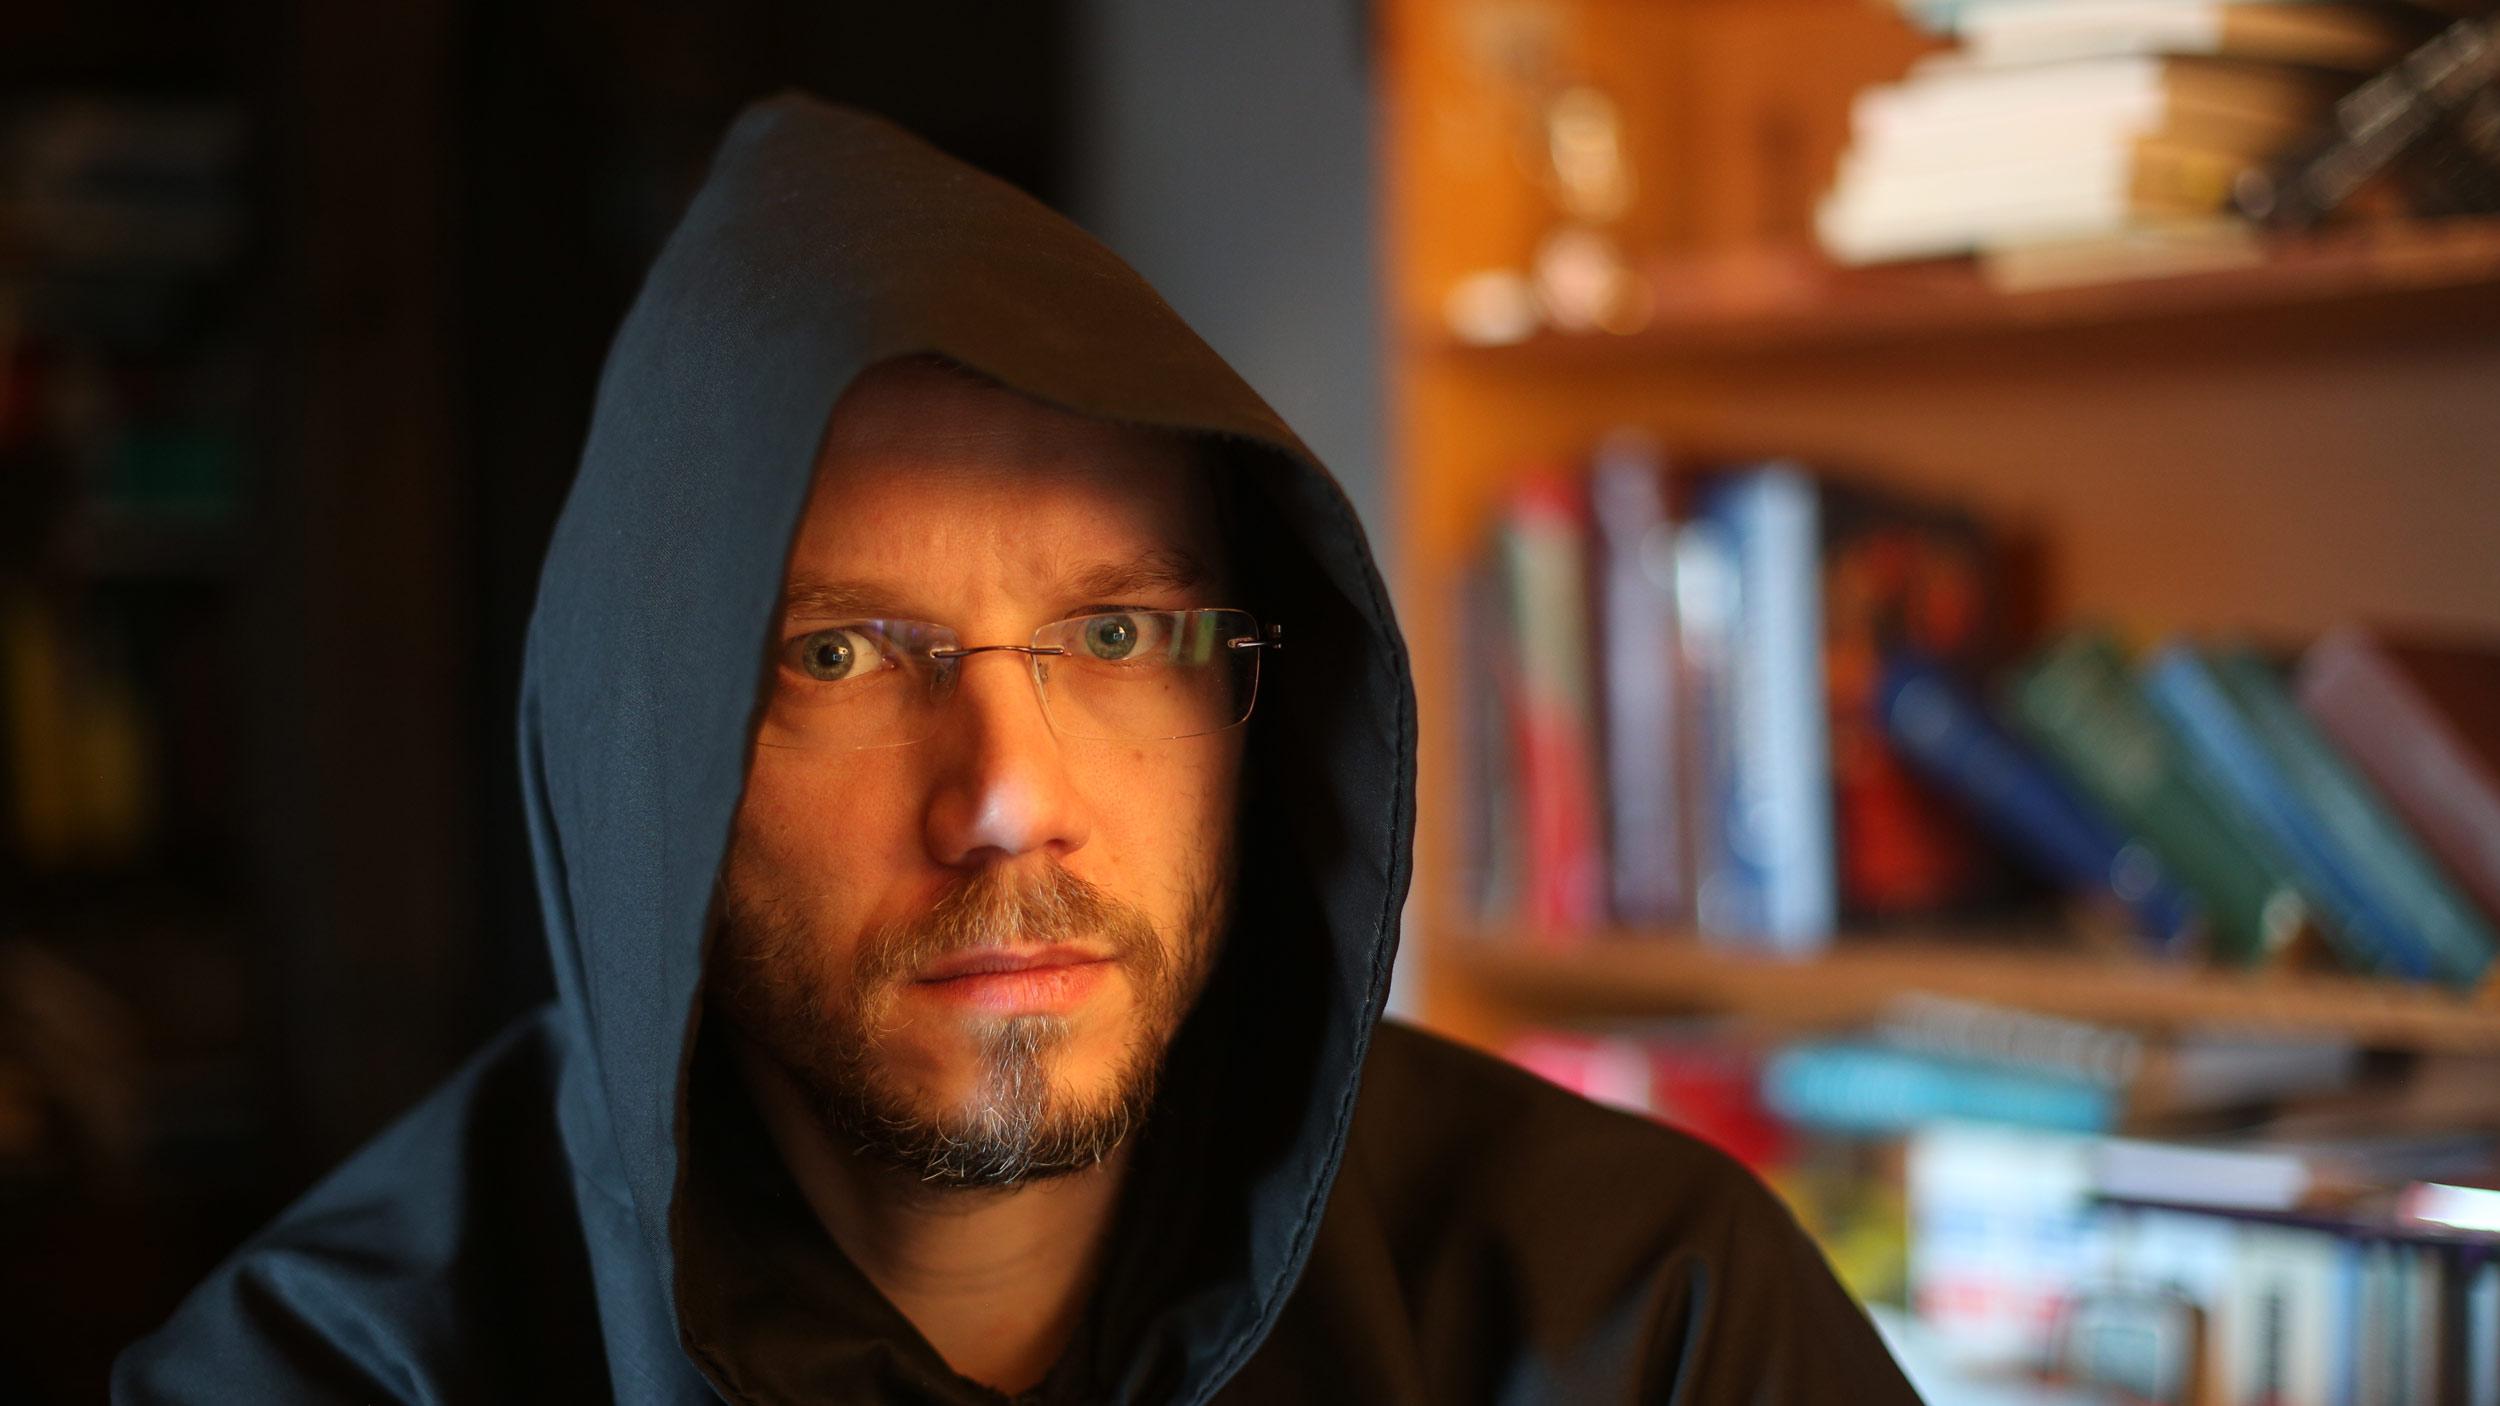 o. Mateusz Stachowski